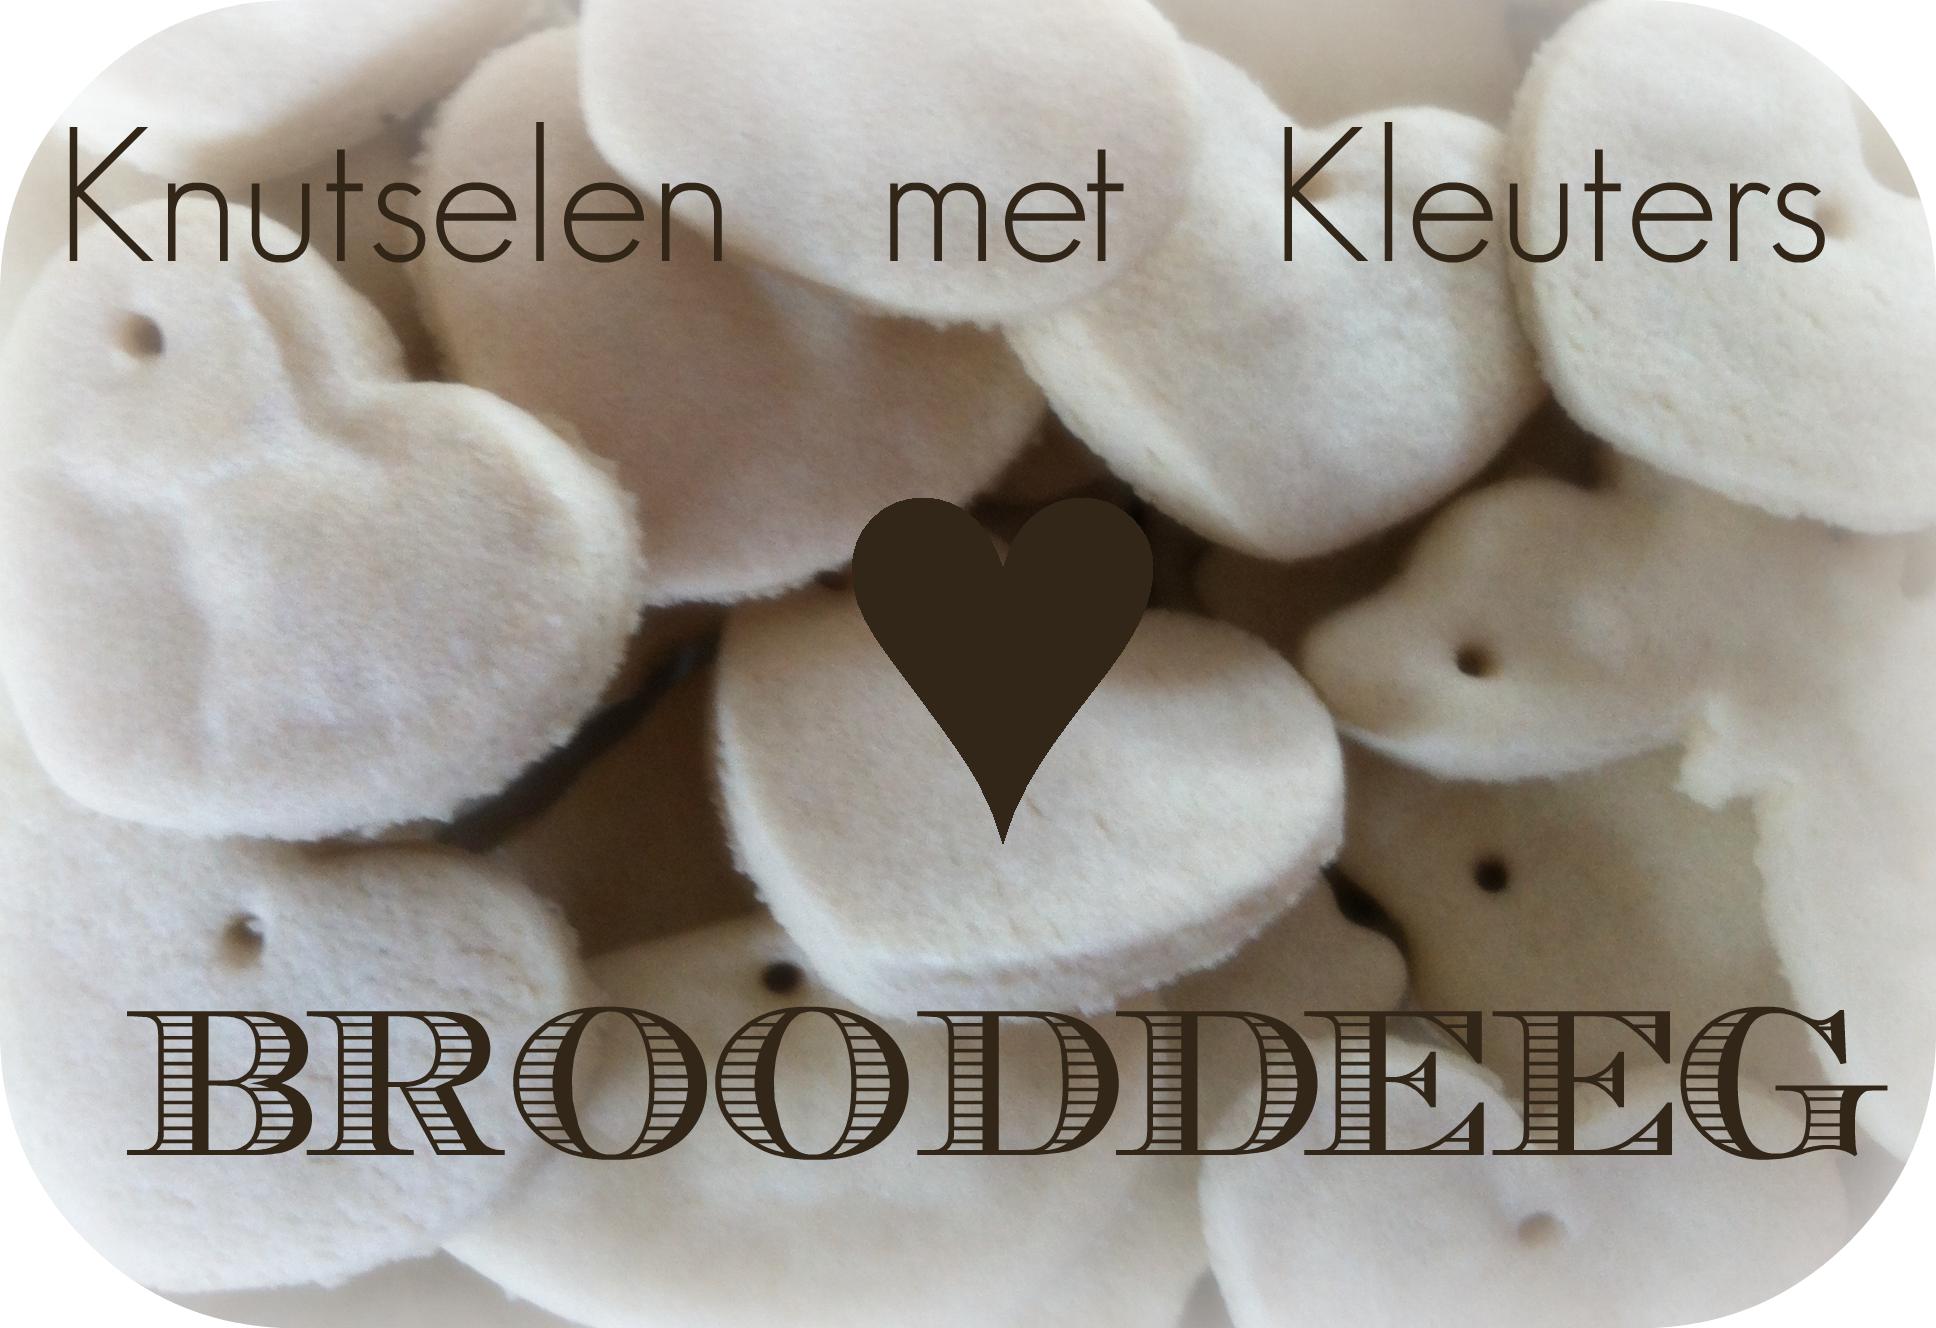 Zelf brooddeeg maken om mee te knutselen: www.mar-joya.nl/diy-knutselen-met-kleuters-brooddeeg